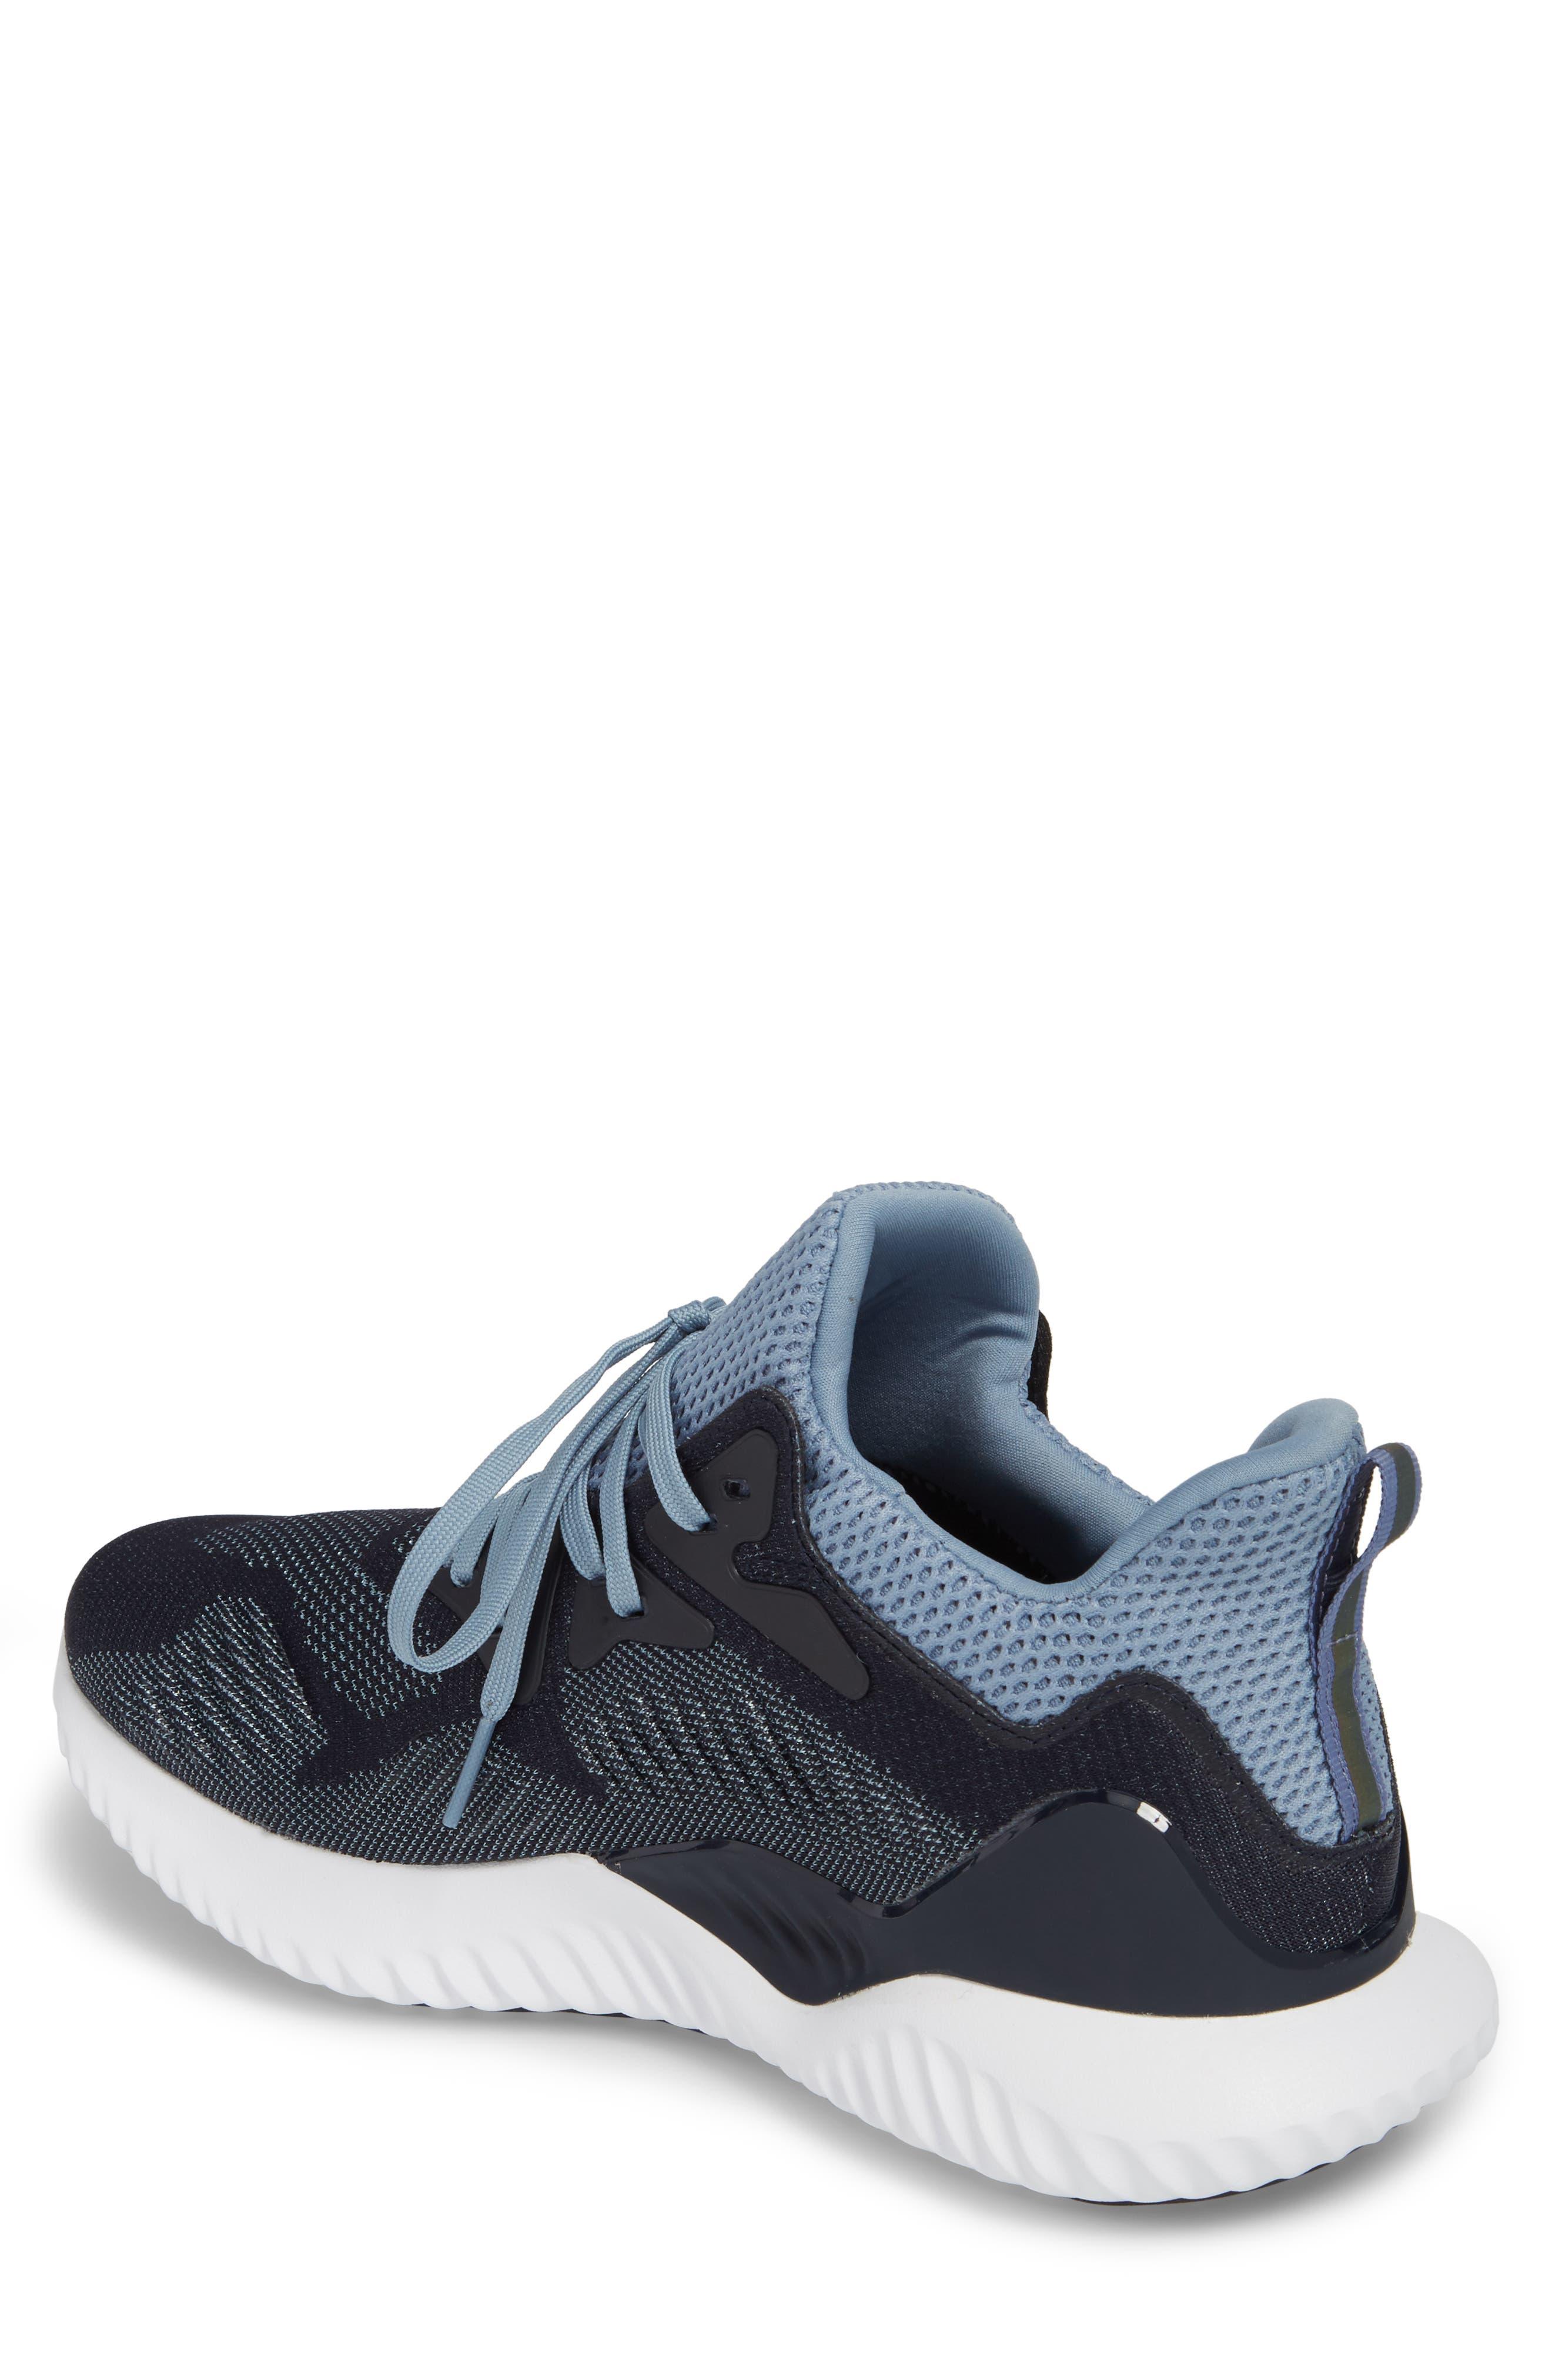 Alternate Image 2  - adidas AlphaBounce Beyond Knit Running Shoe (Men)